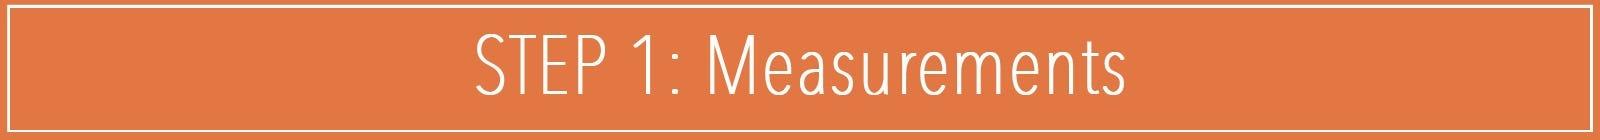 Step 1: Measurements